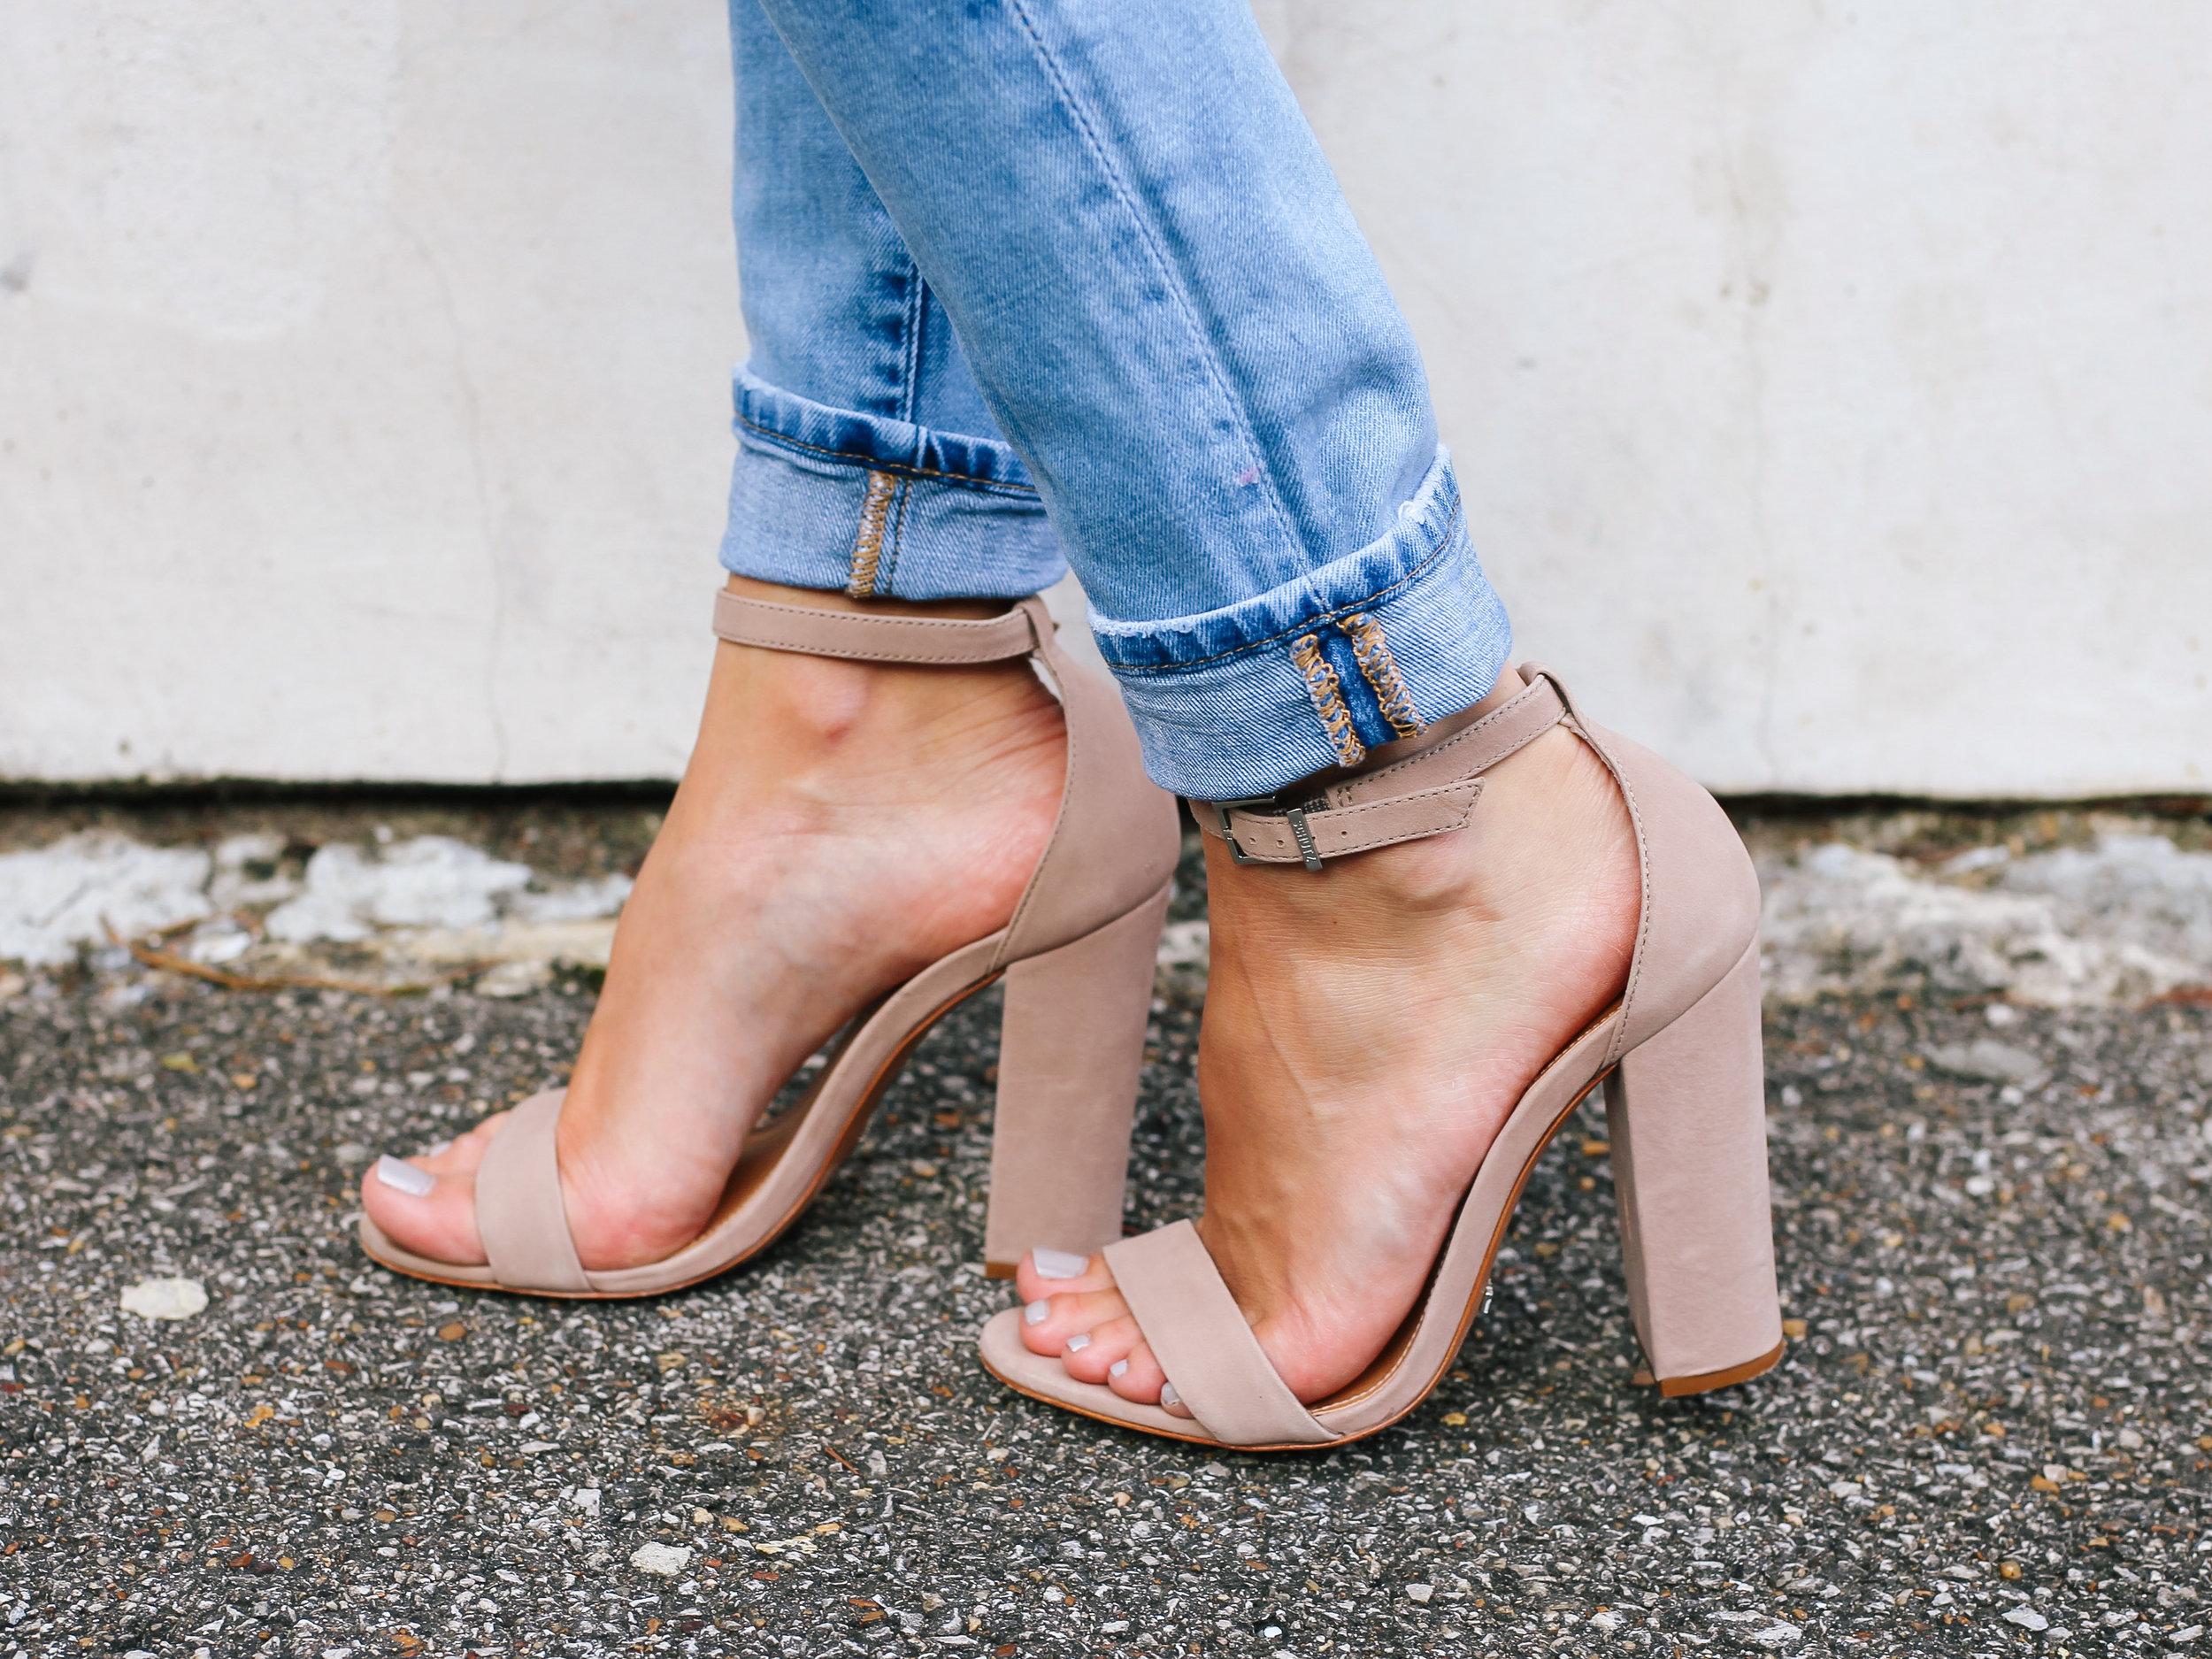 fashion blogger lcb style mignonne gavigan ruffle top schutz shoes (26 of 55).jpg